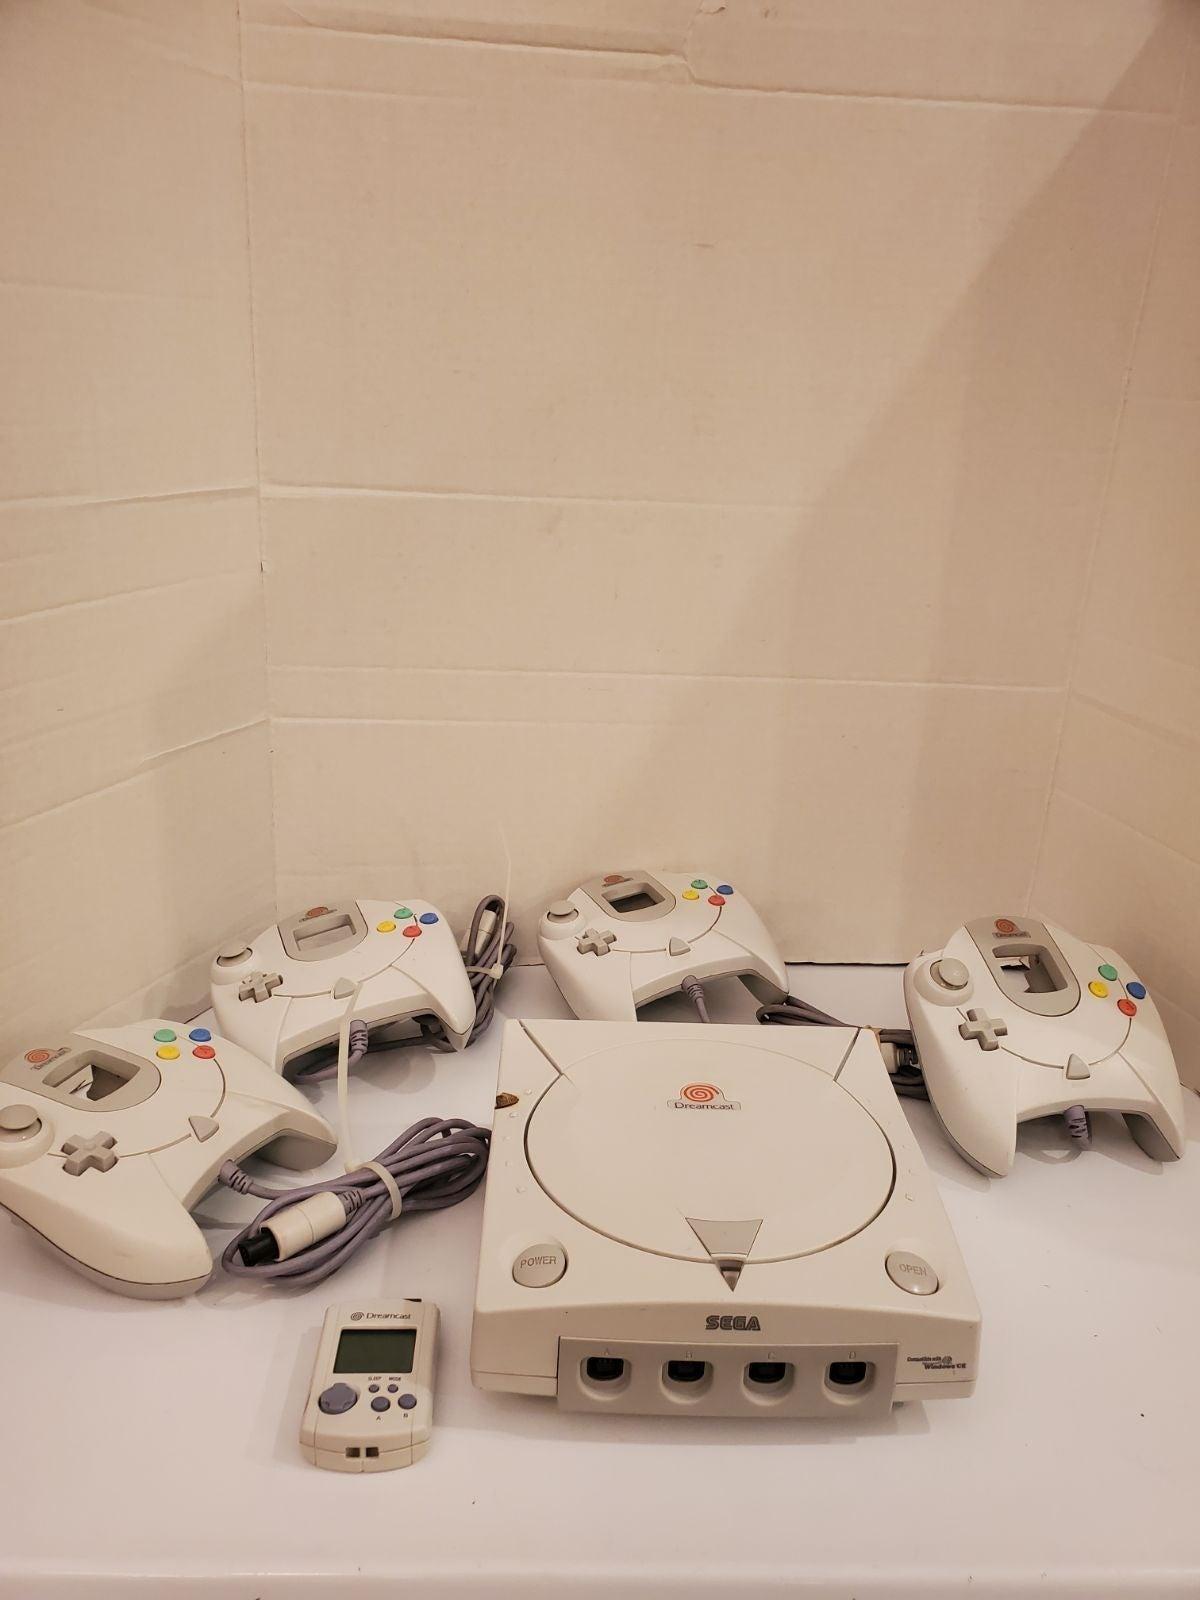 Sega dreamcast console Lot